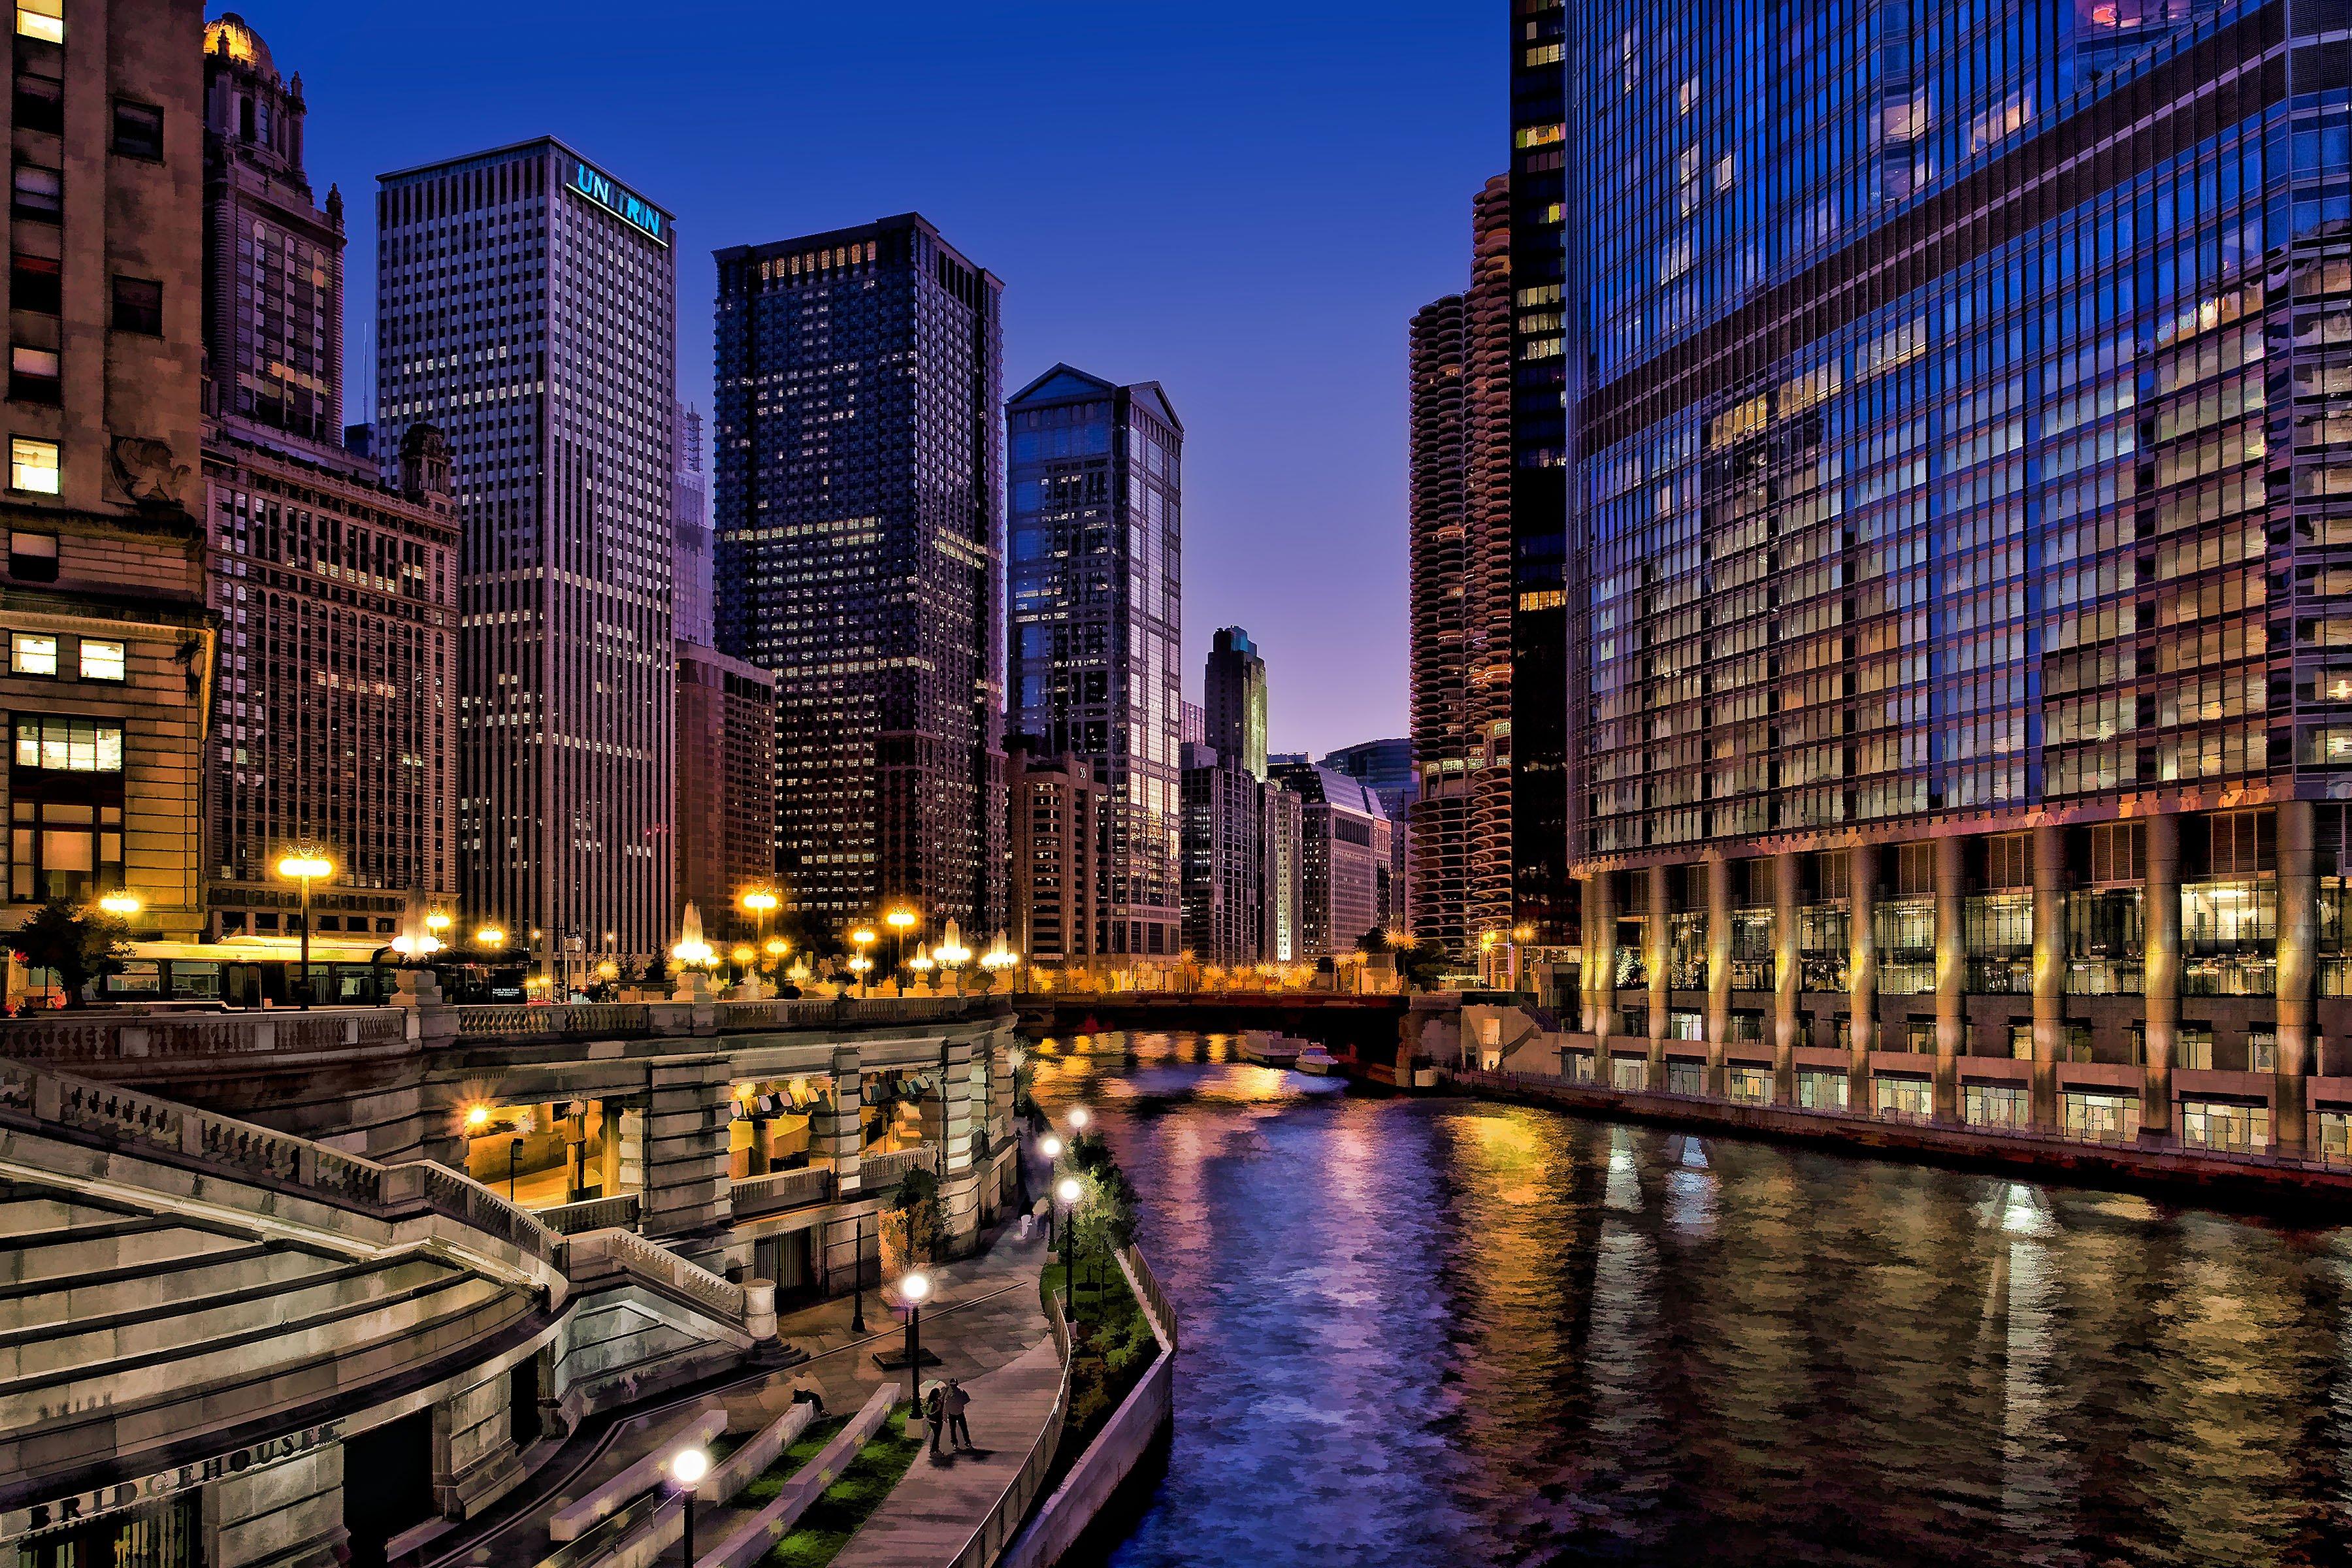 City of Chicago Wallpaper - WallpaperSafari